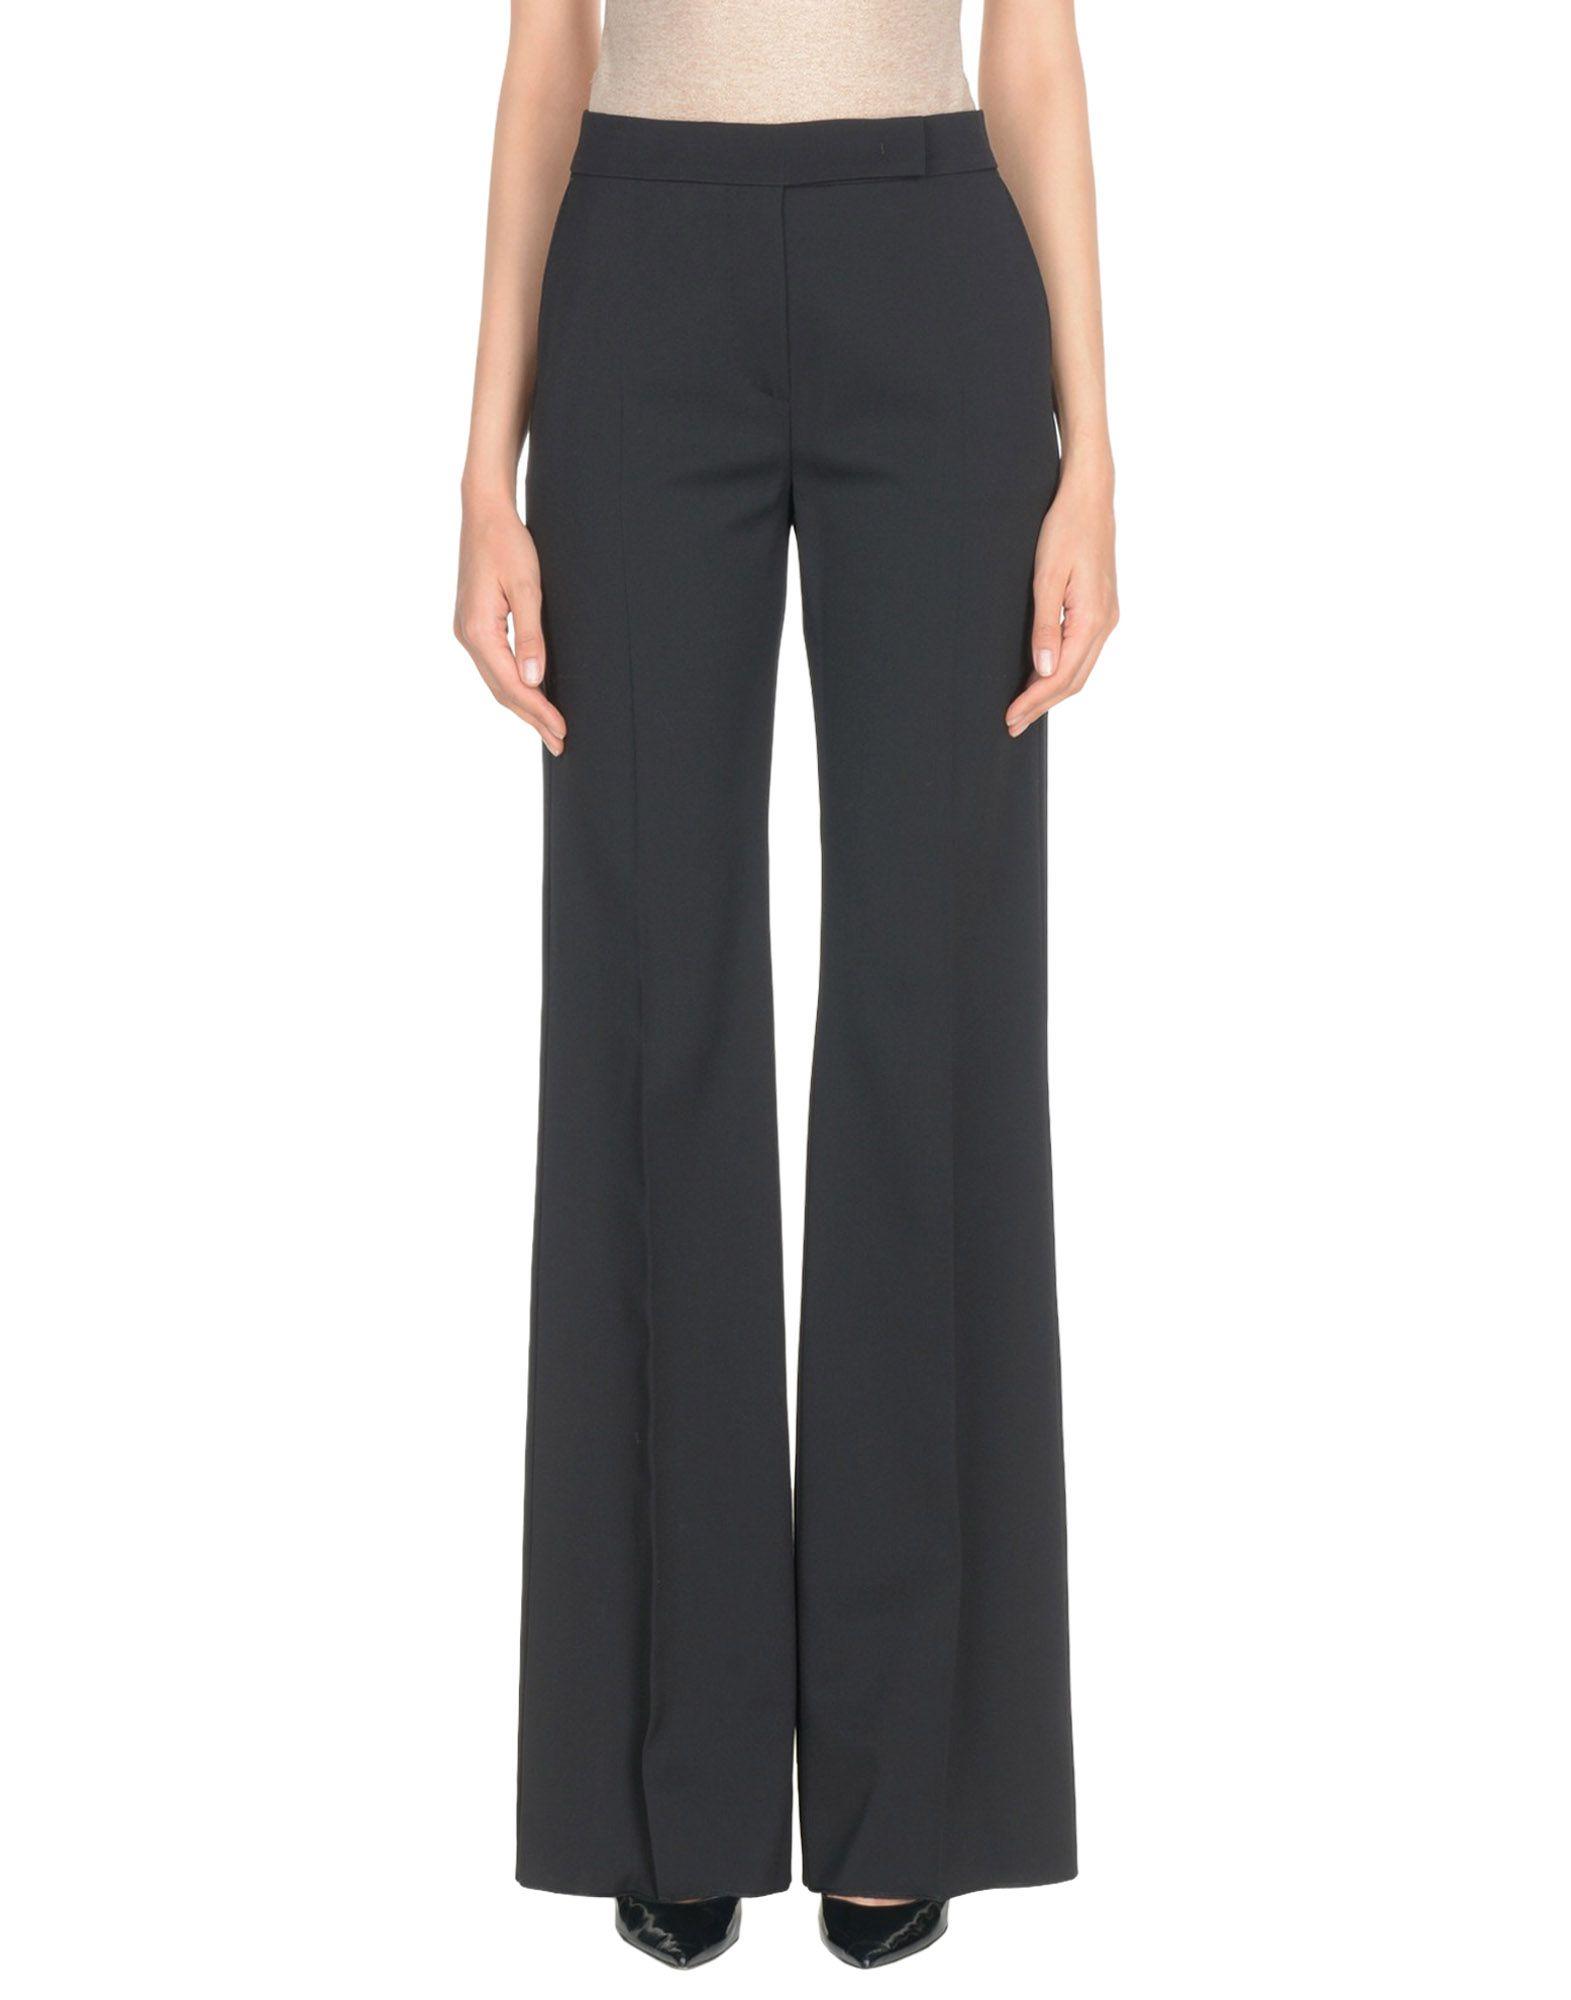 Pantalone Max Mara Donna - Acquista online su b1P9AAXir